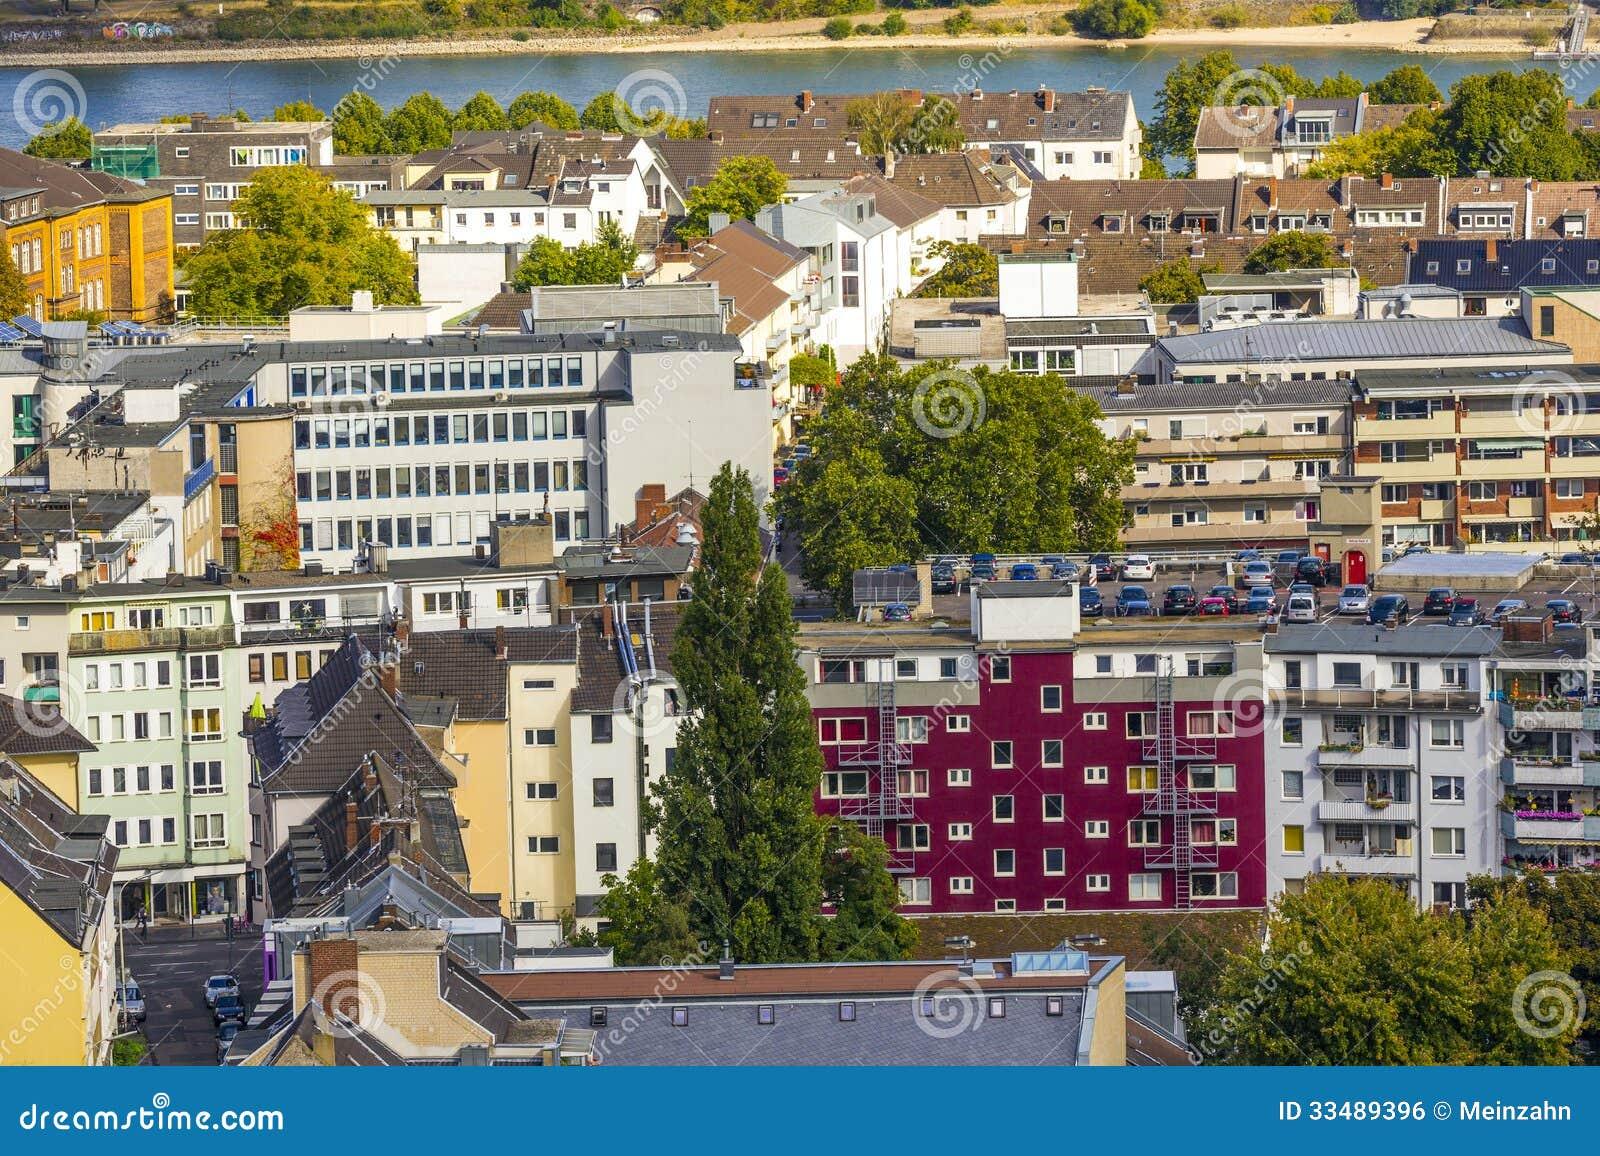 bonn hauptstadt deutschland